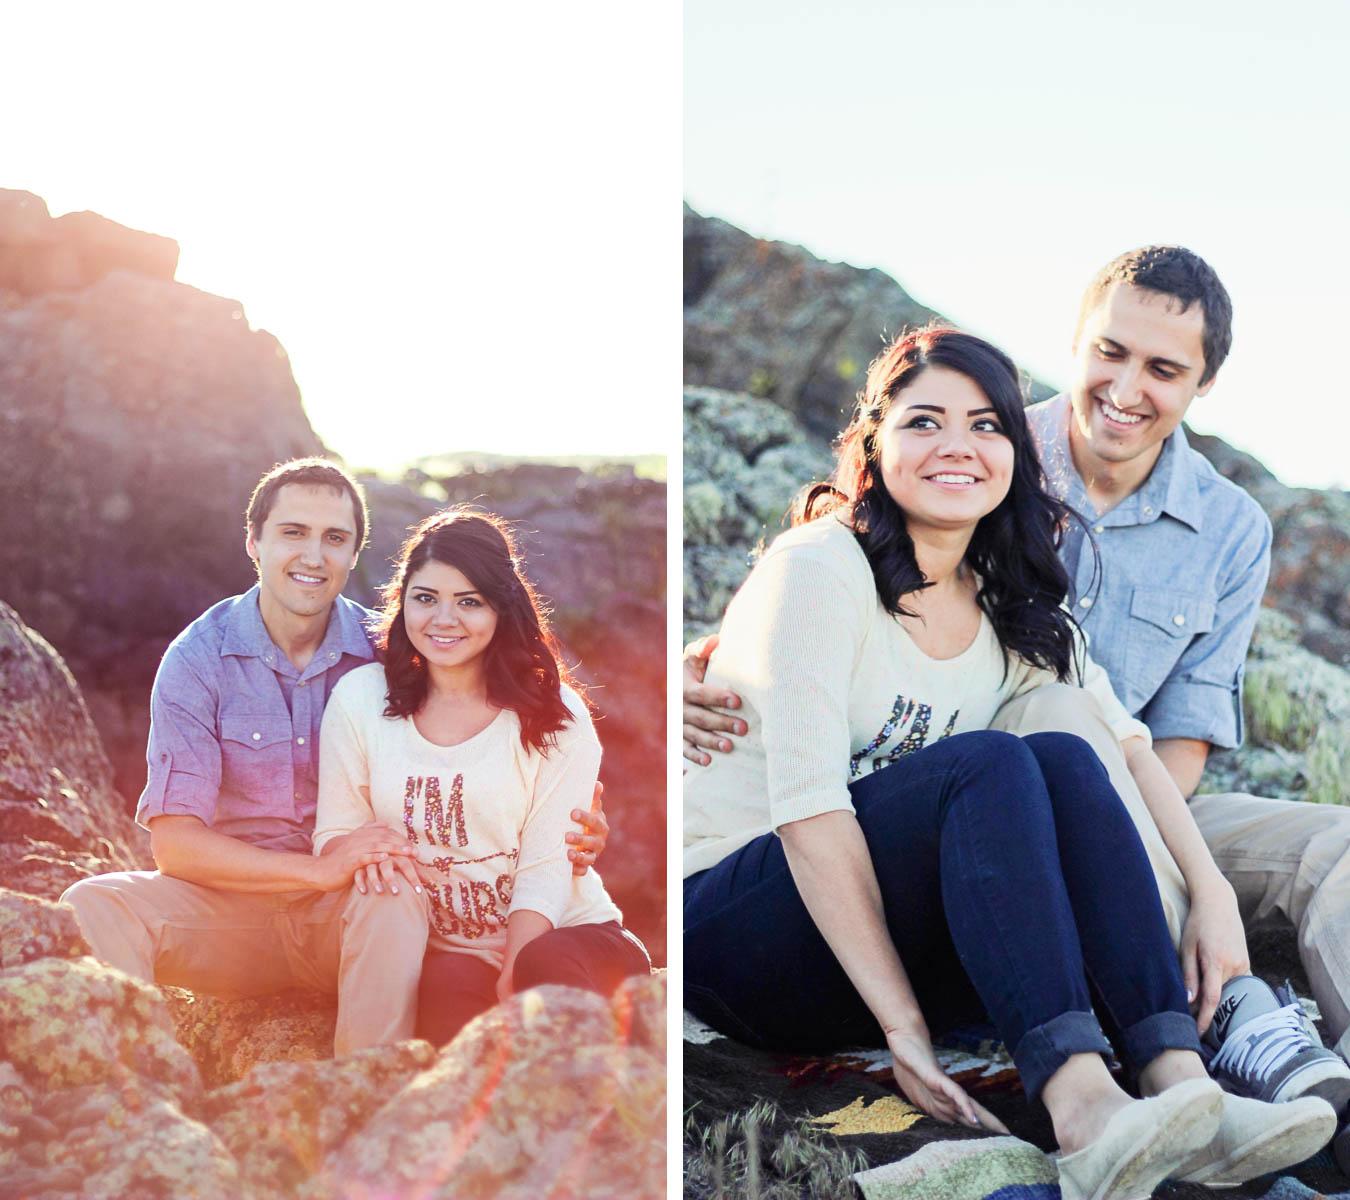 charlie-broc-couples-session-rexburg-idaho-chicago-engagement-photographer-claytonphotodesign-01.jpg